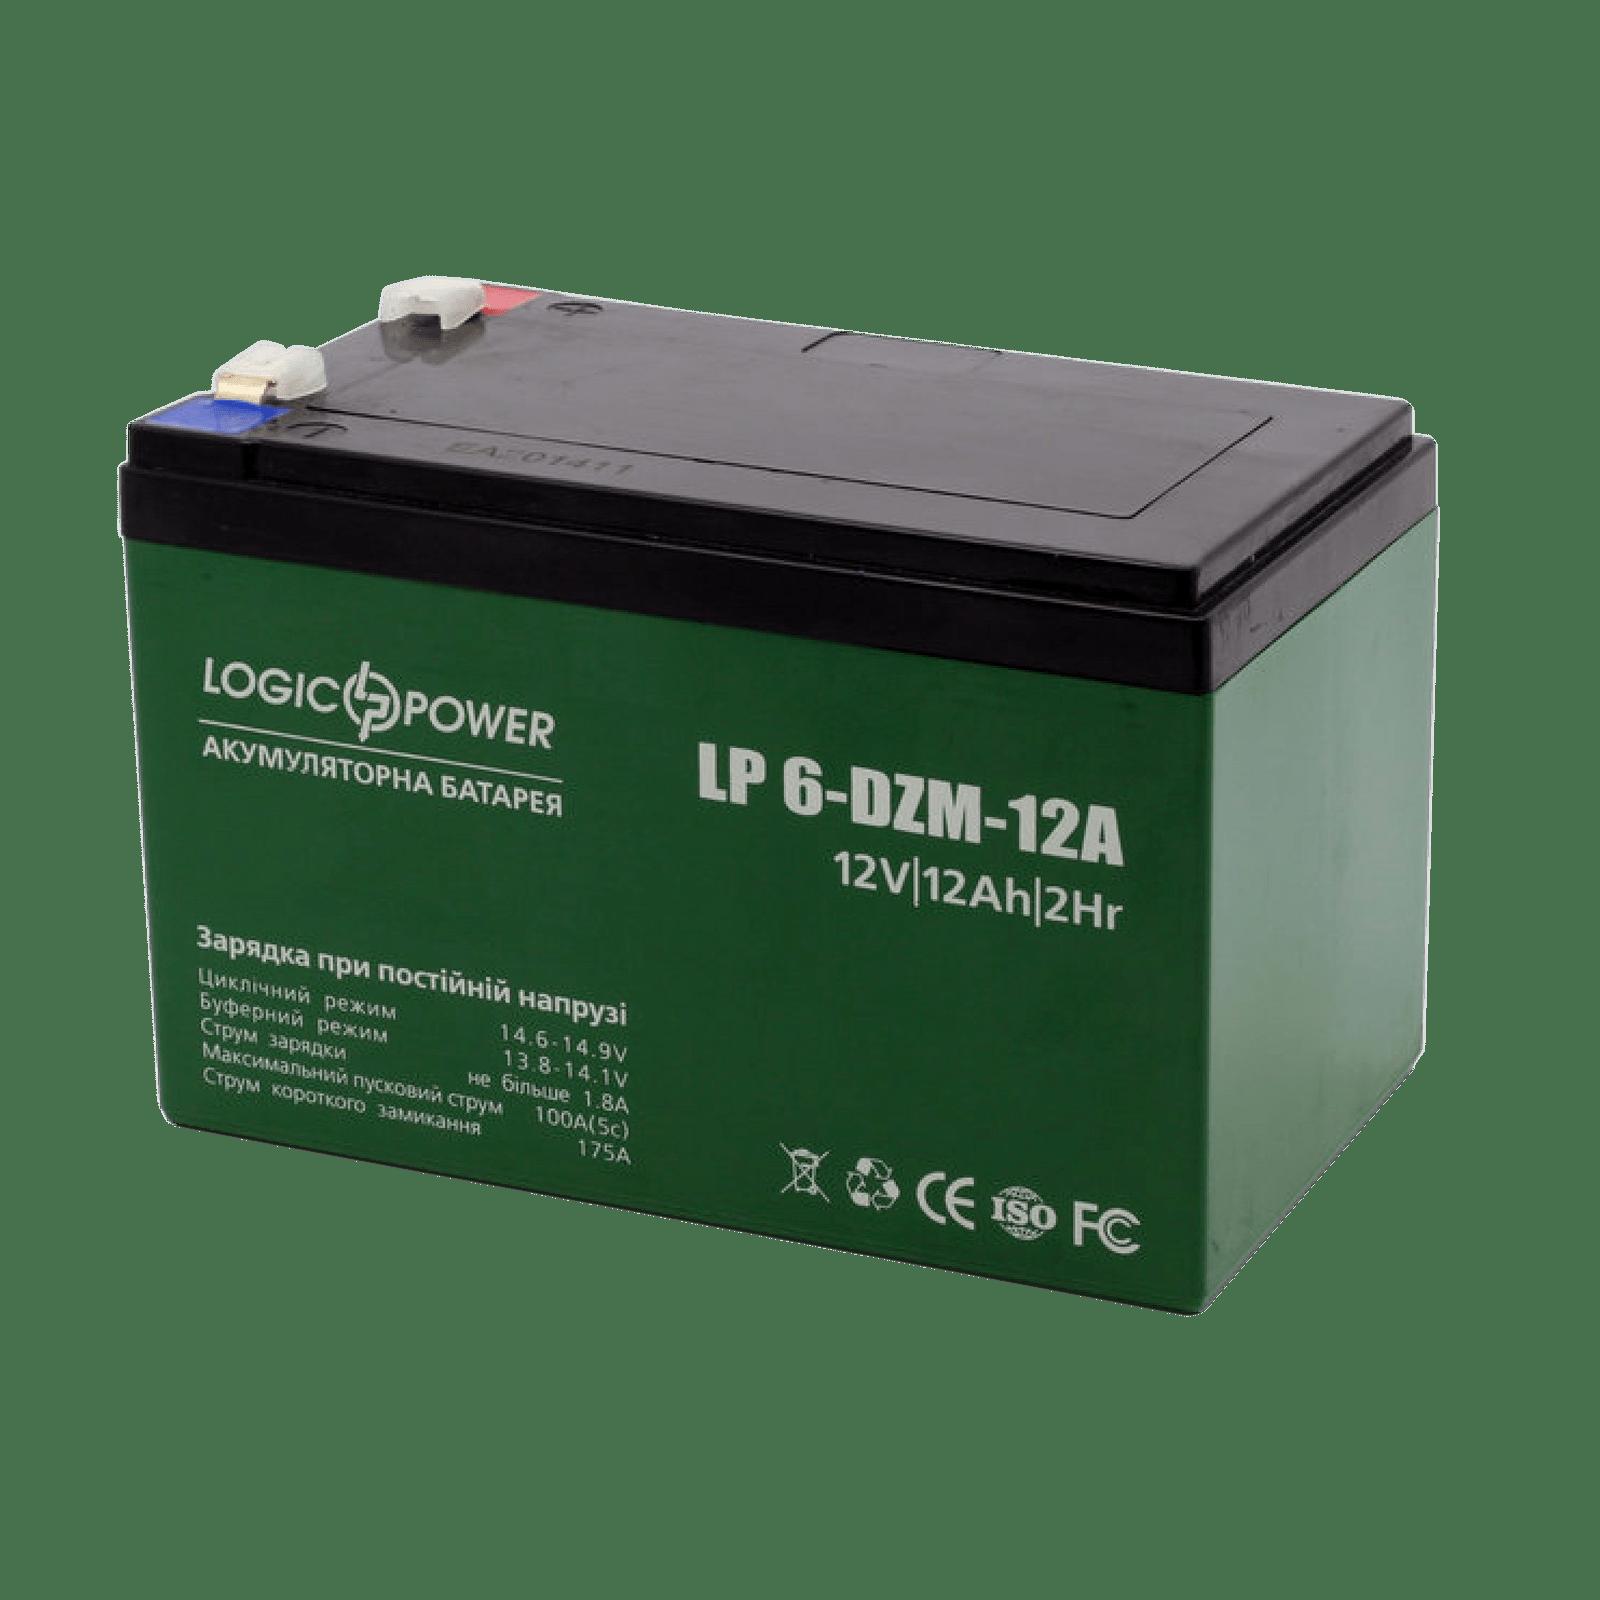 LP 6-DZM-12 12V 12Аh тяговый аккумулятор для электровелосипеда